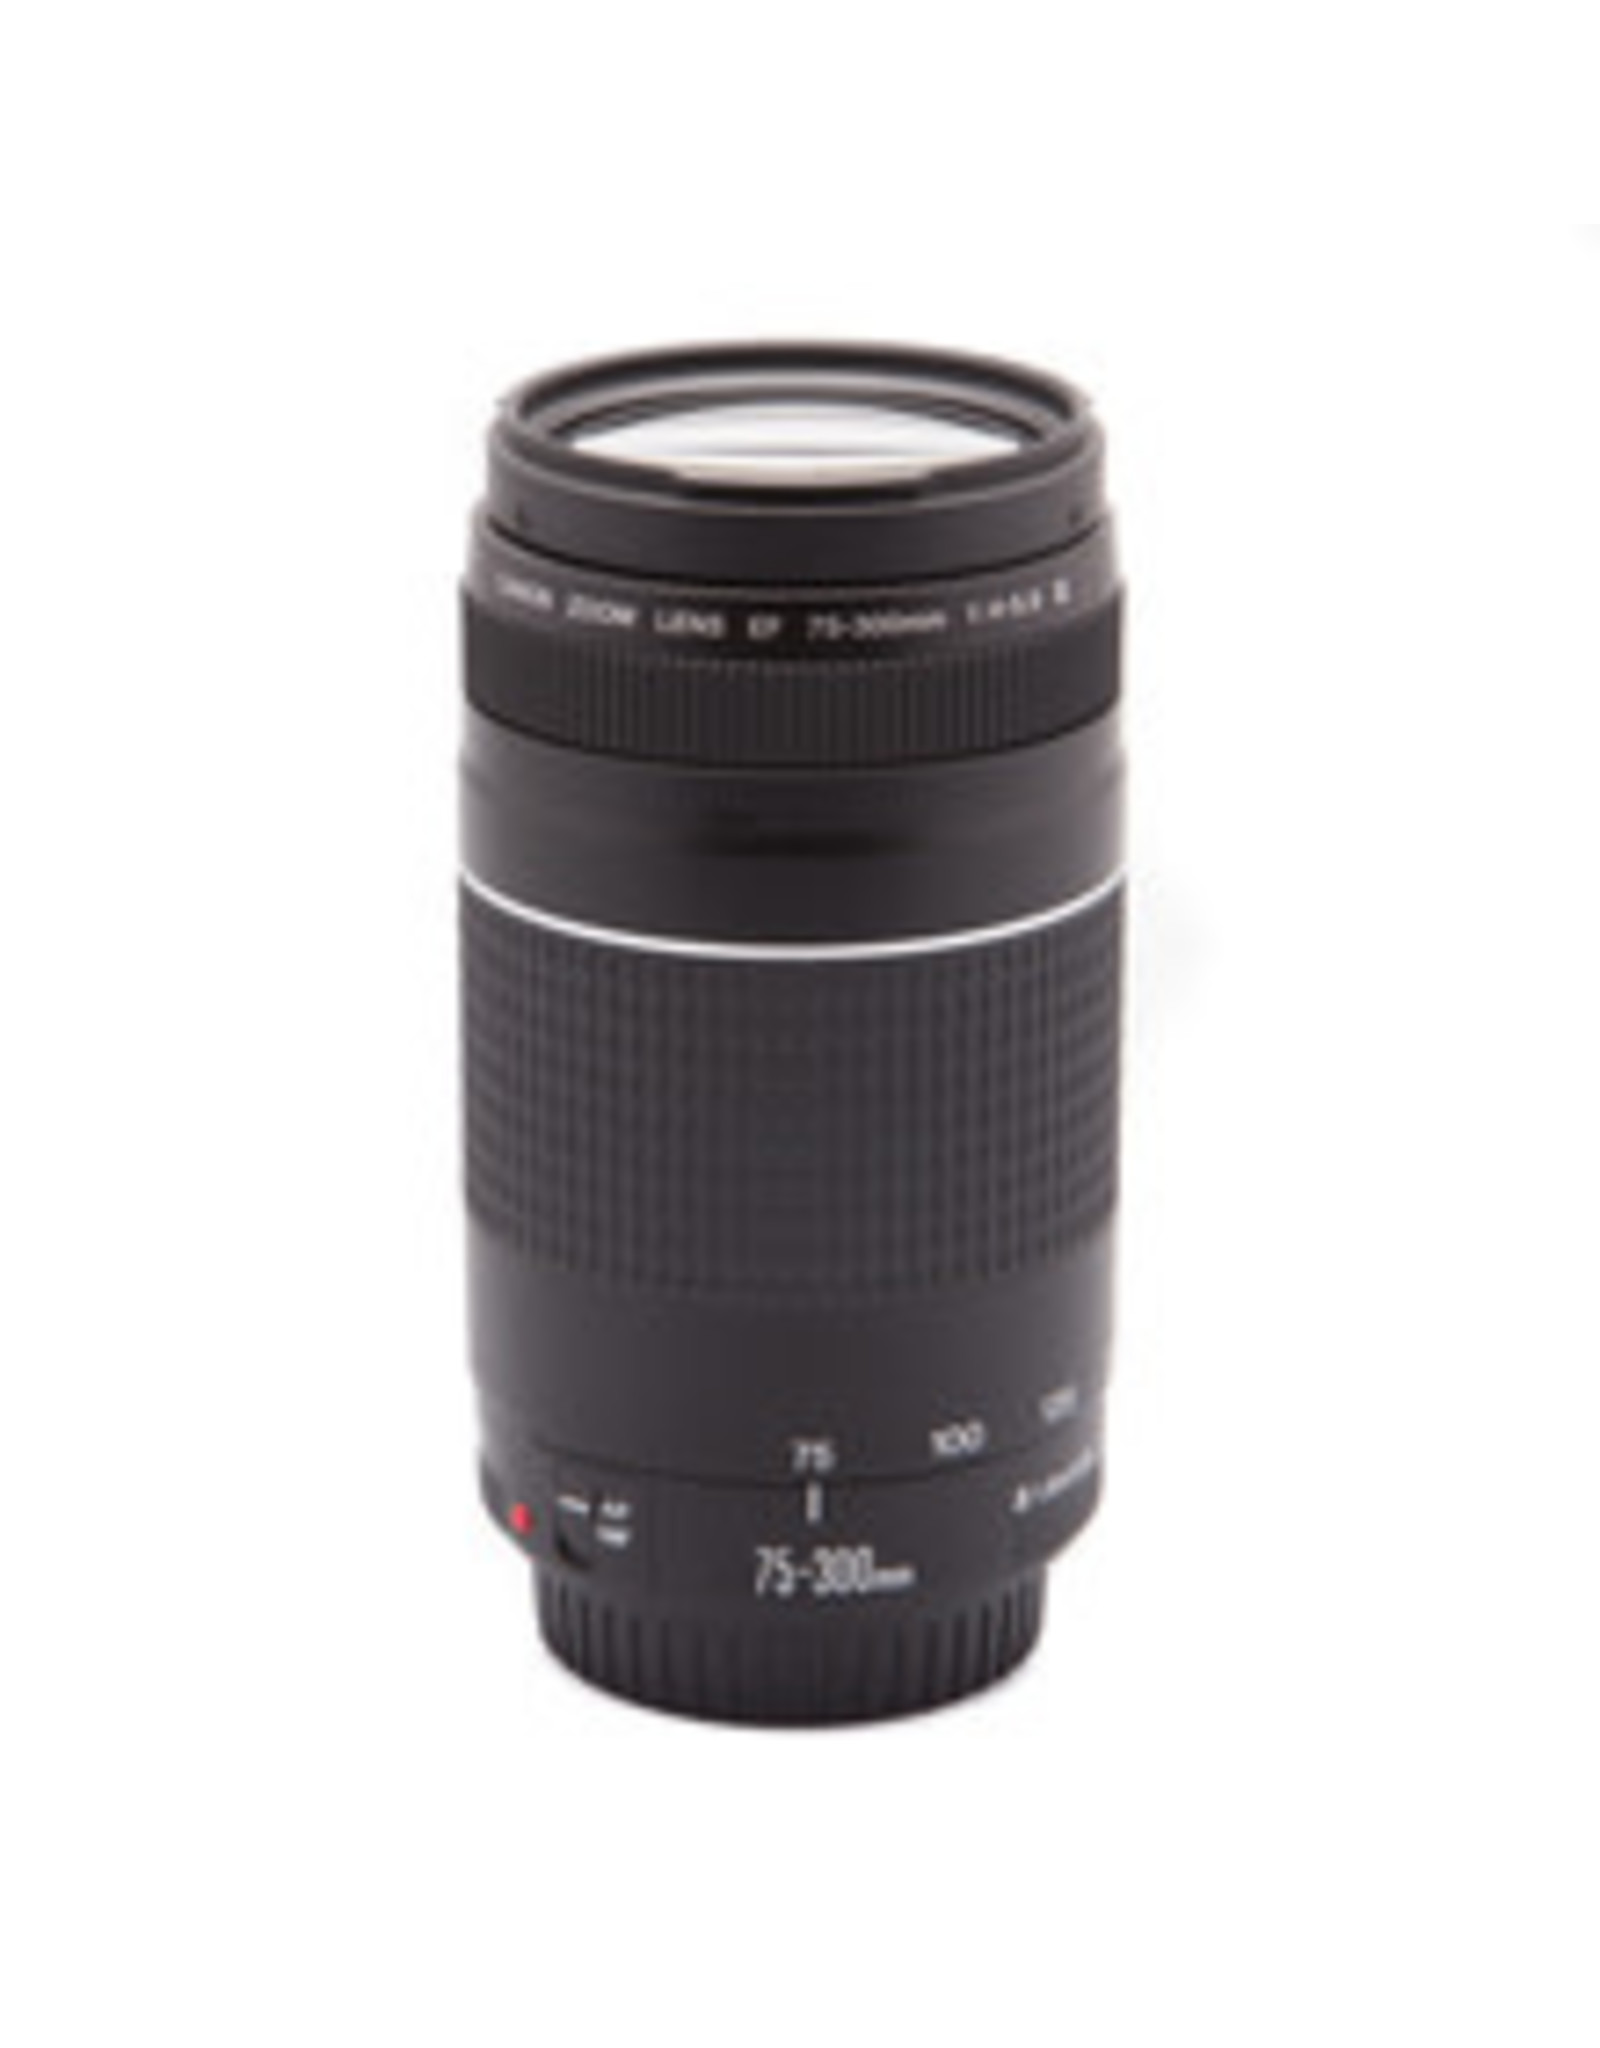 Canon CANON 75-300MM F4-5.6 III LENS